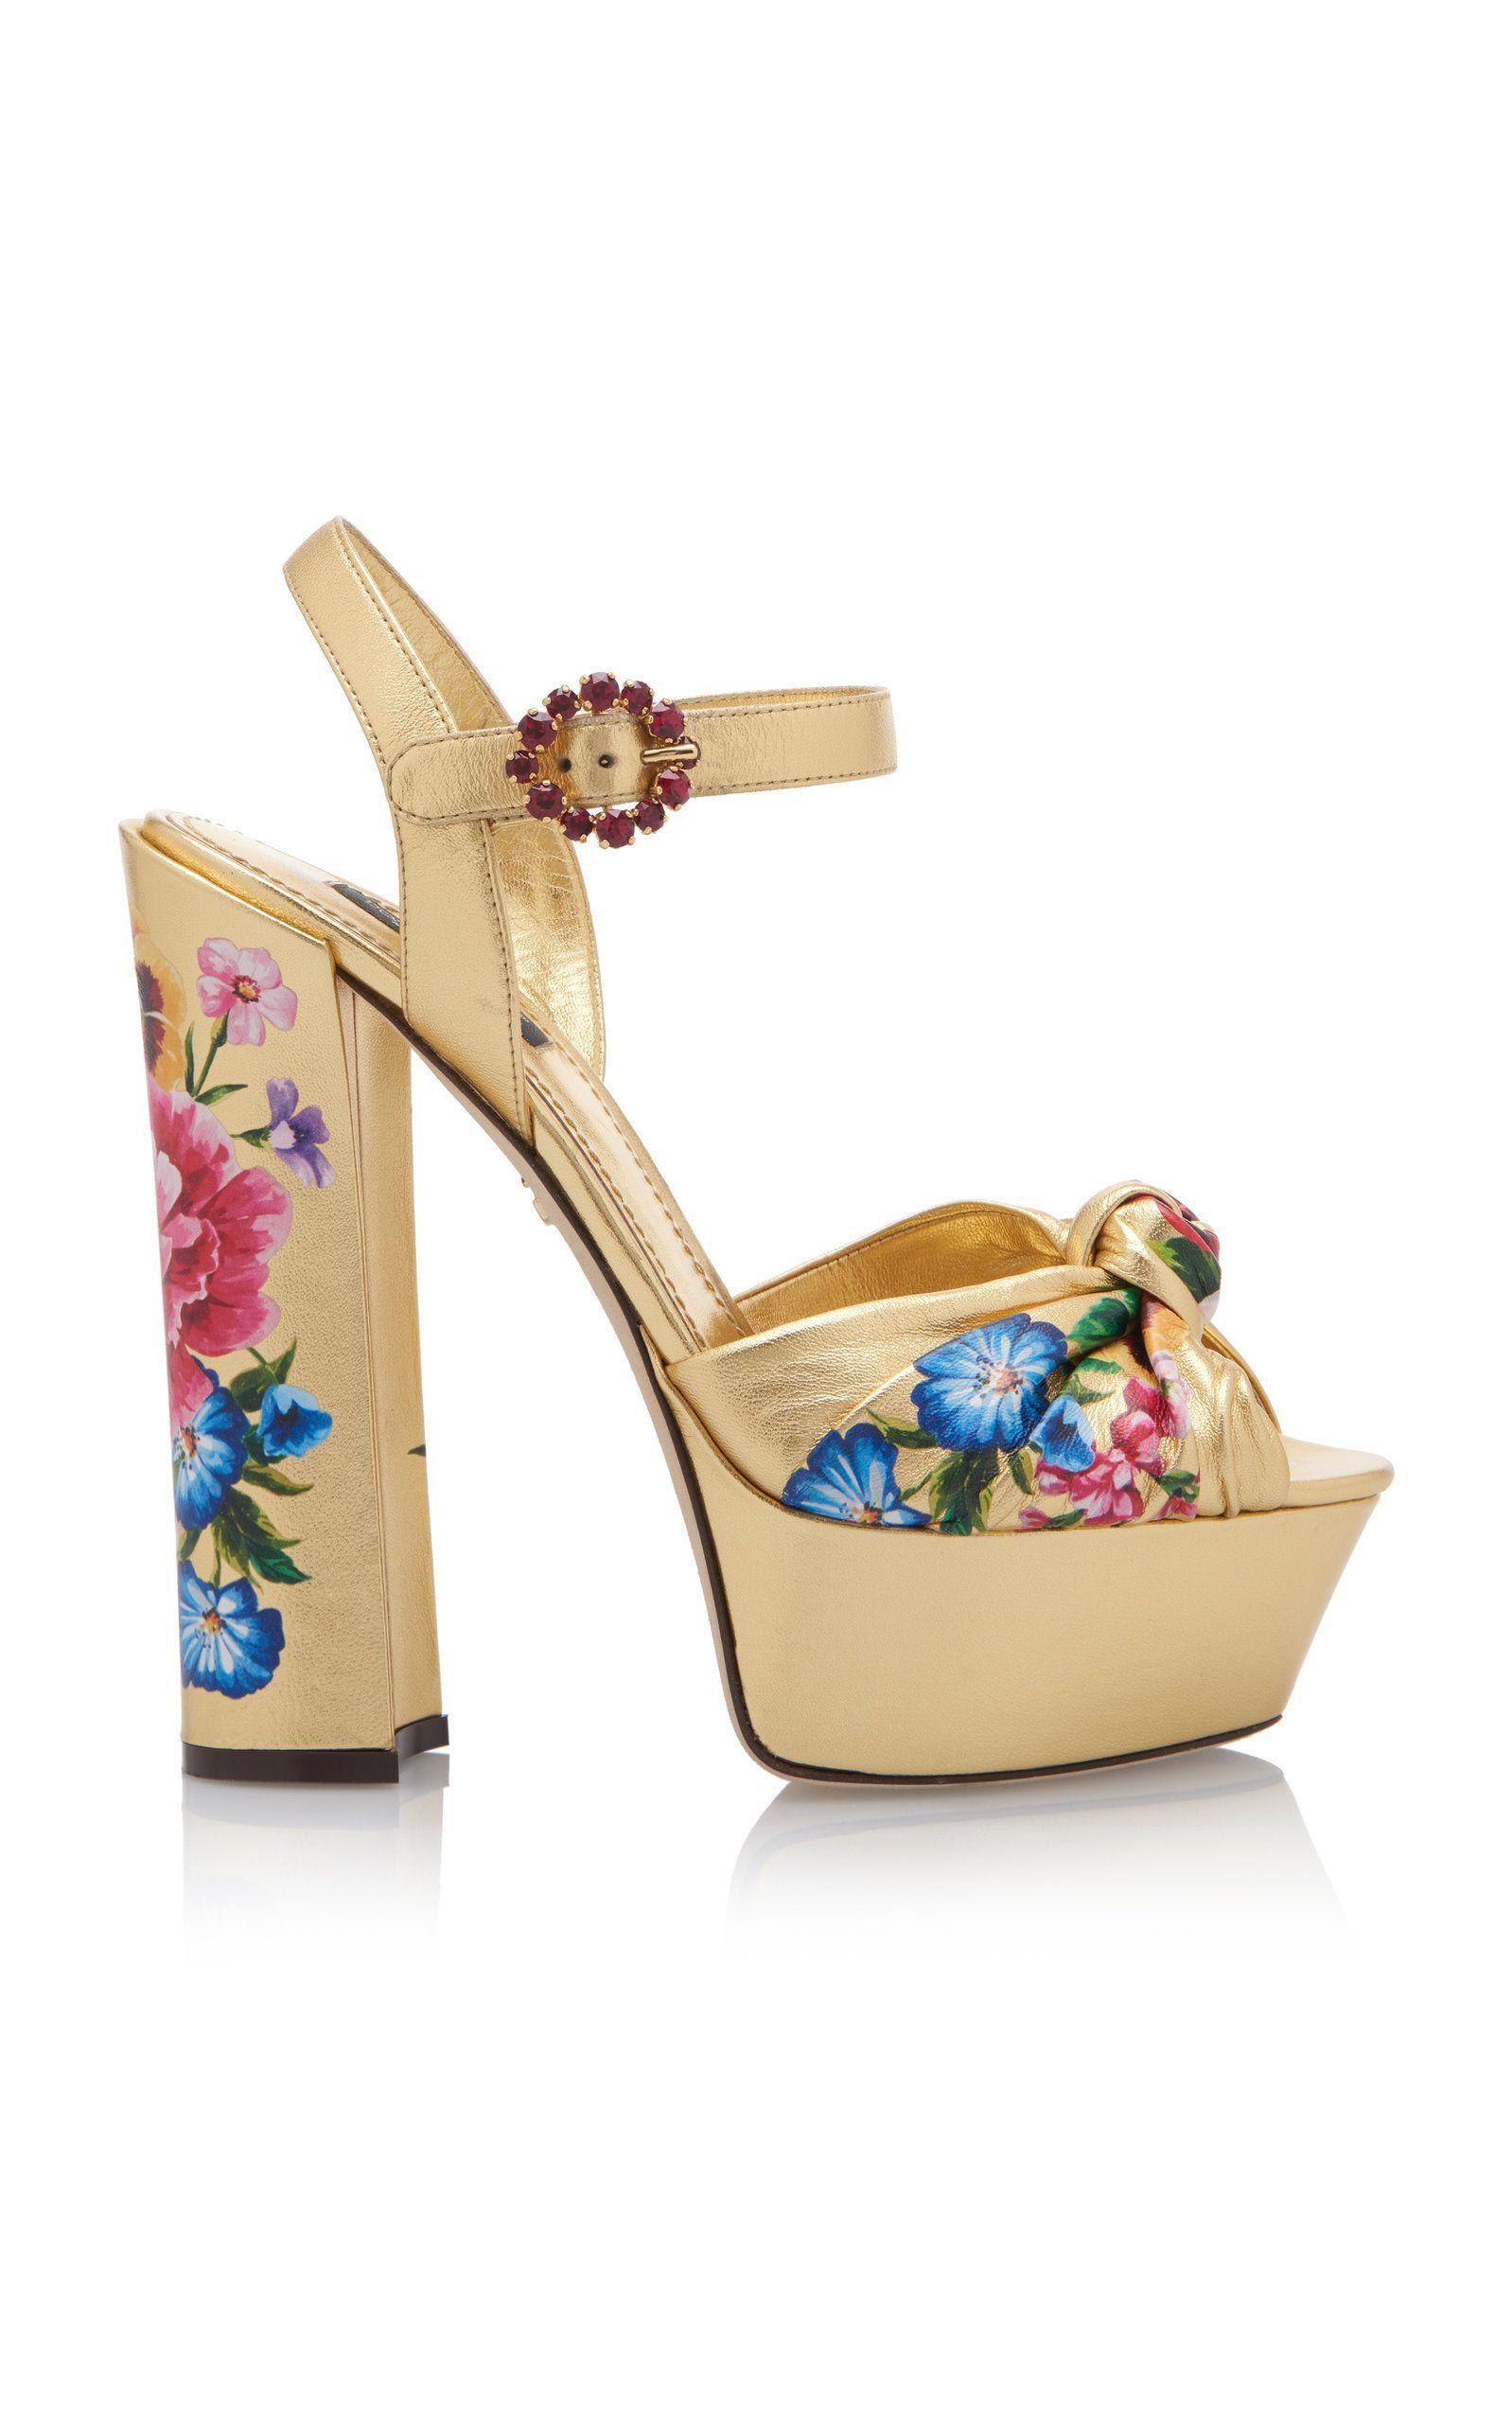 ffc9a6a5da7f 55 Best Wedding Shoes for 2018 - Ivory